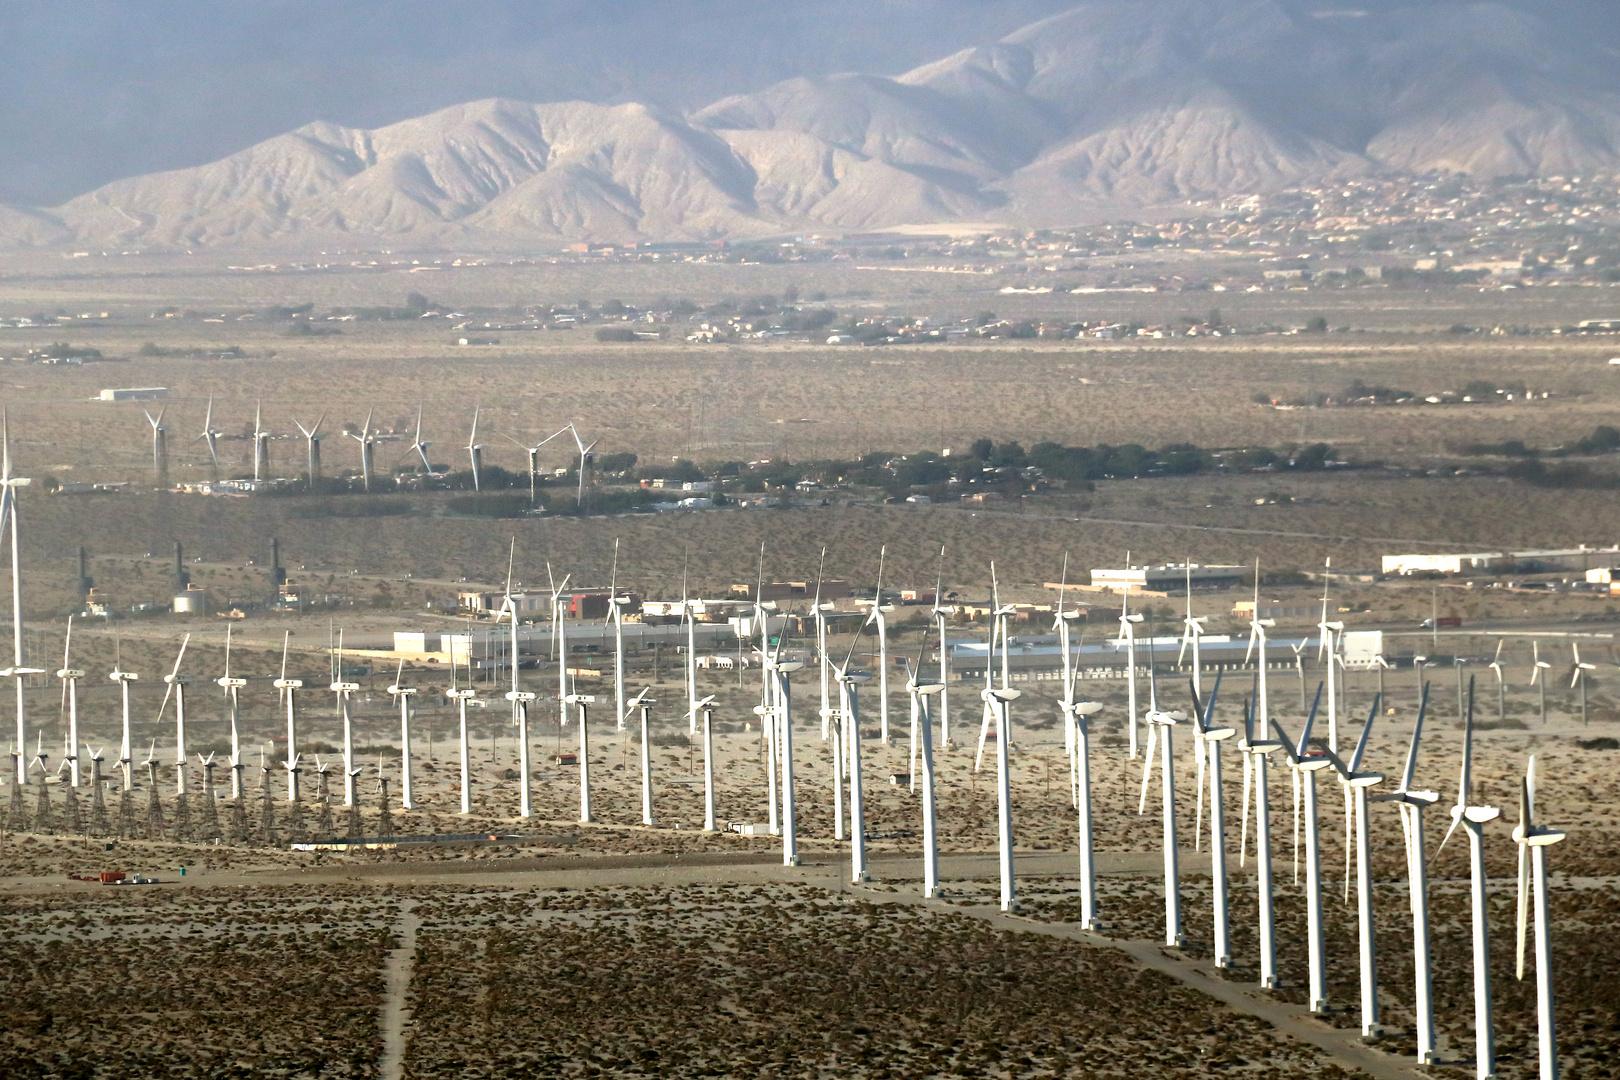 Windmills in Palm Springs